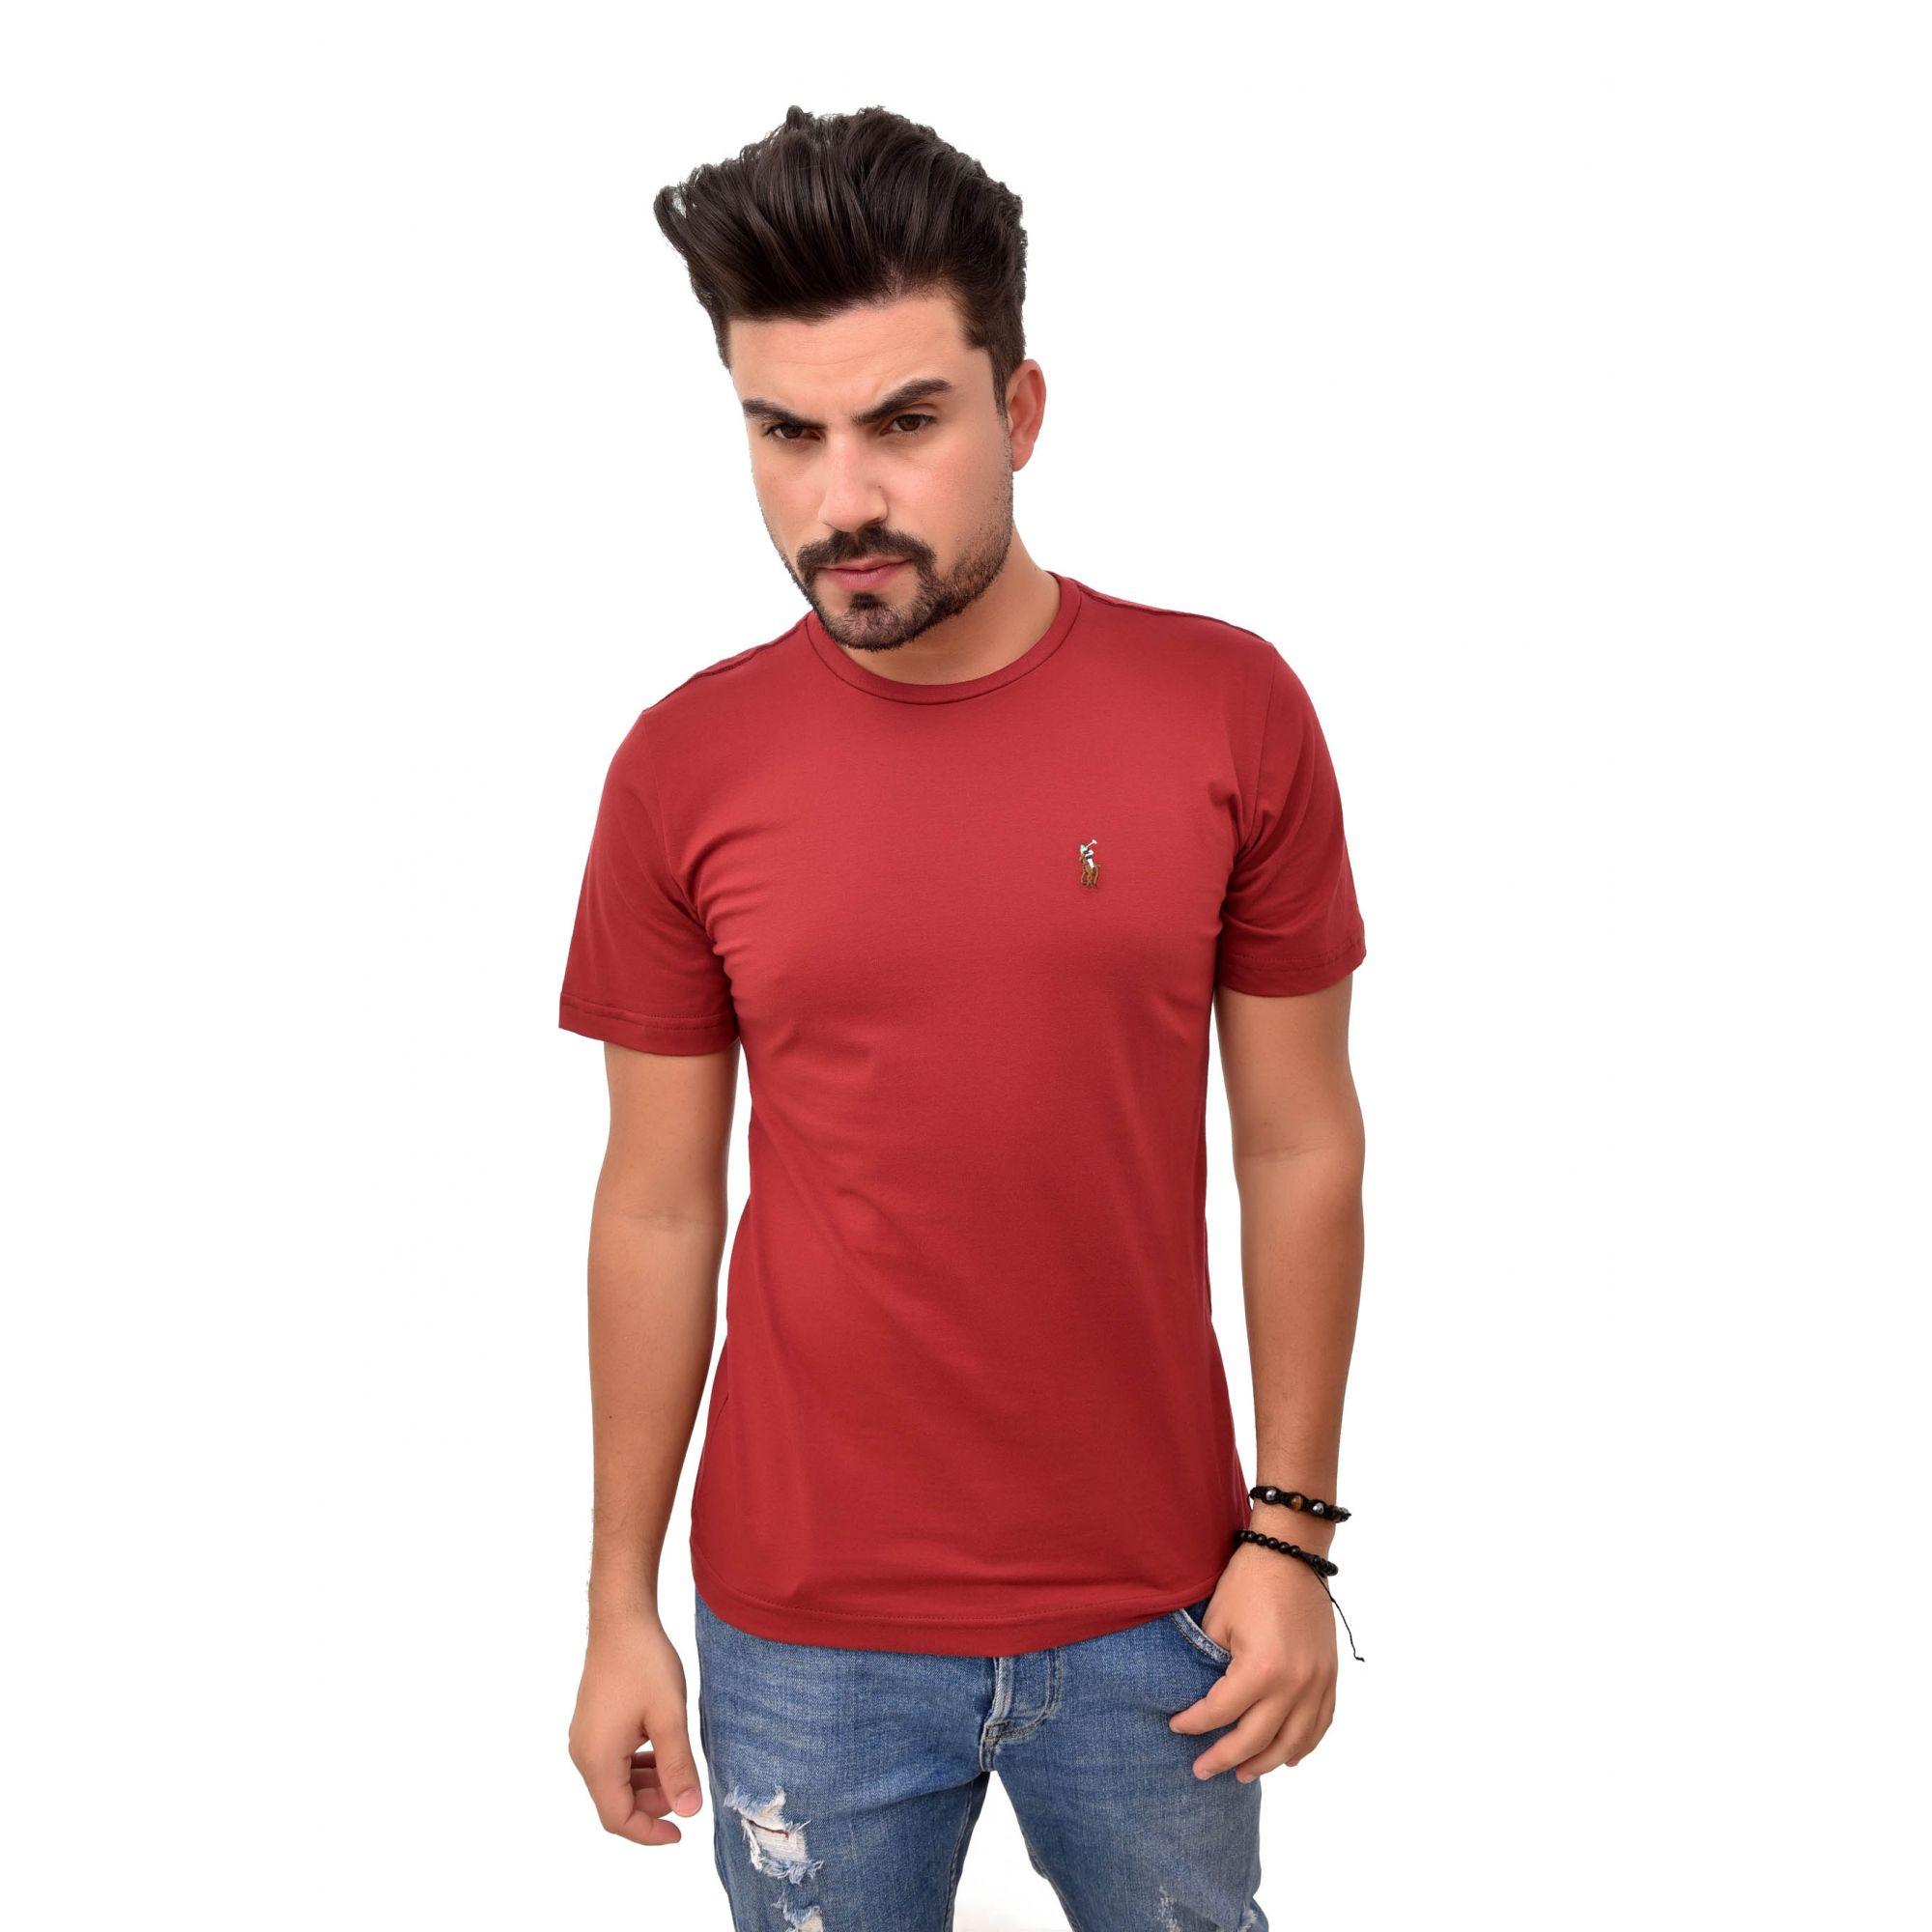 Camiseta Basic RL Vinho Colored